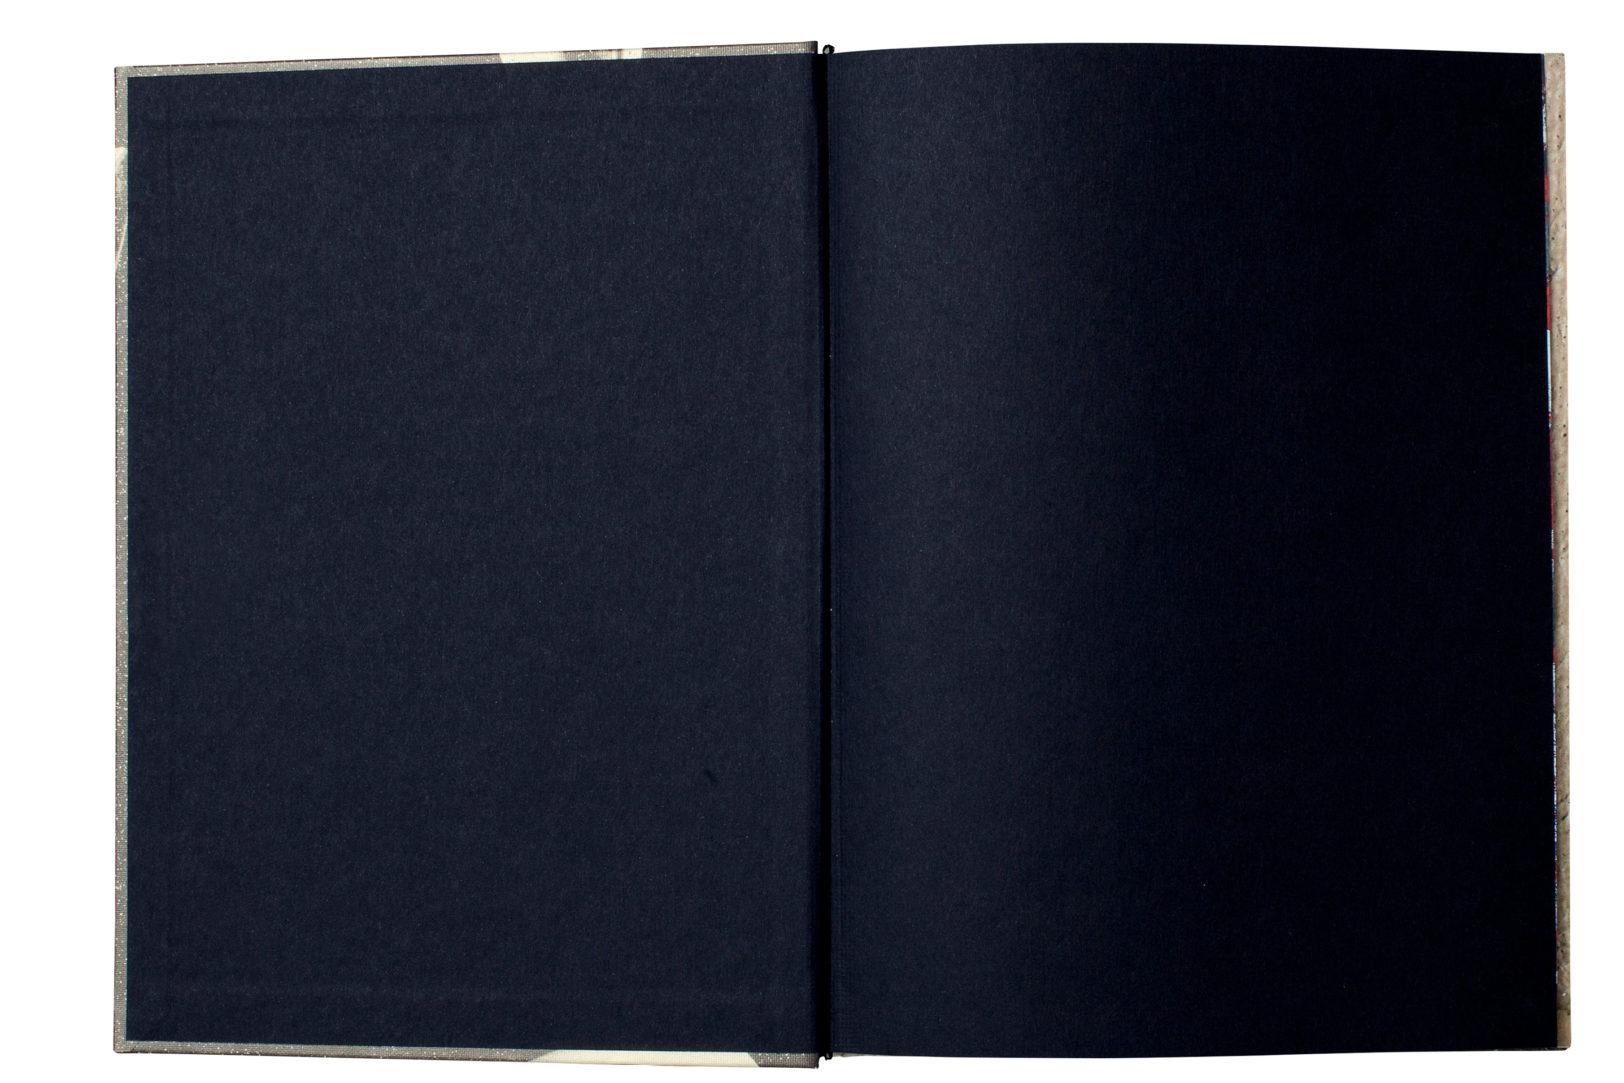 http://e-o-t.de/wordpress/wp-content/uploads/2020/06/Books-Marx-eot4.jpg